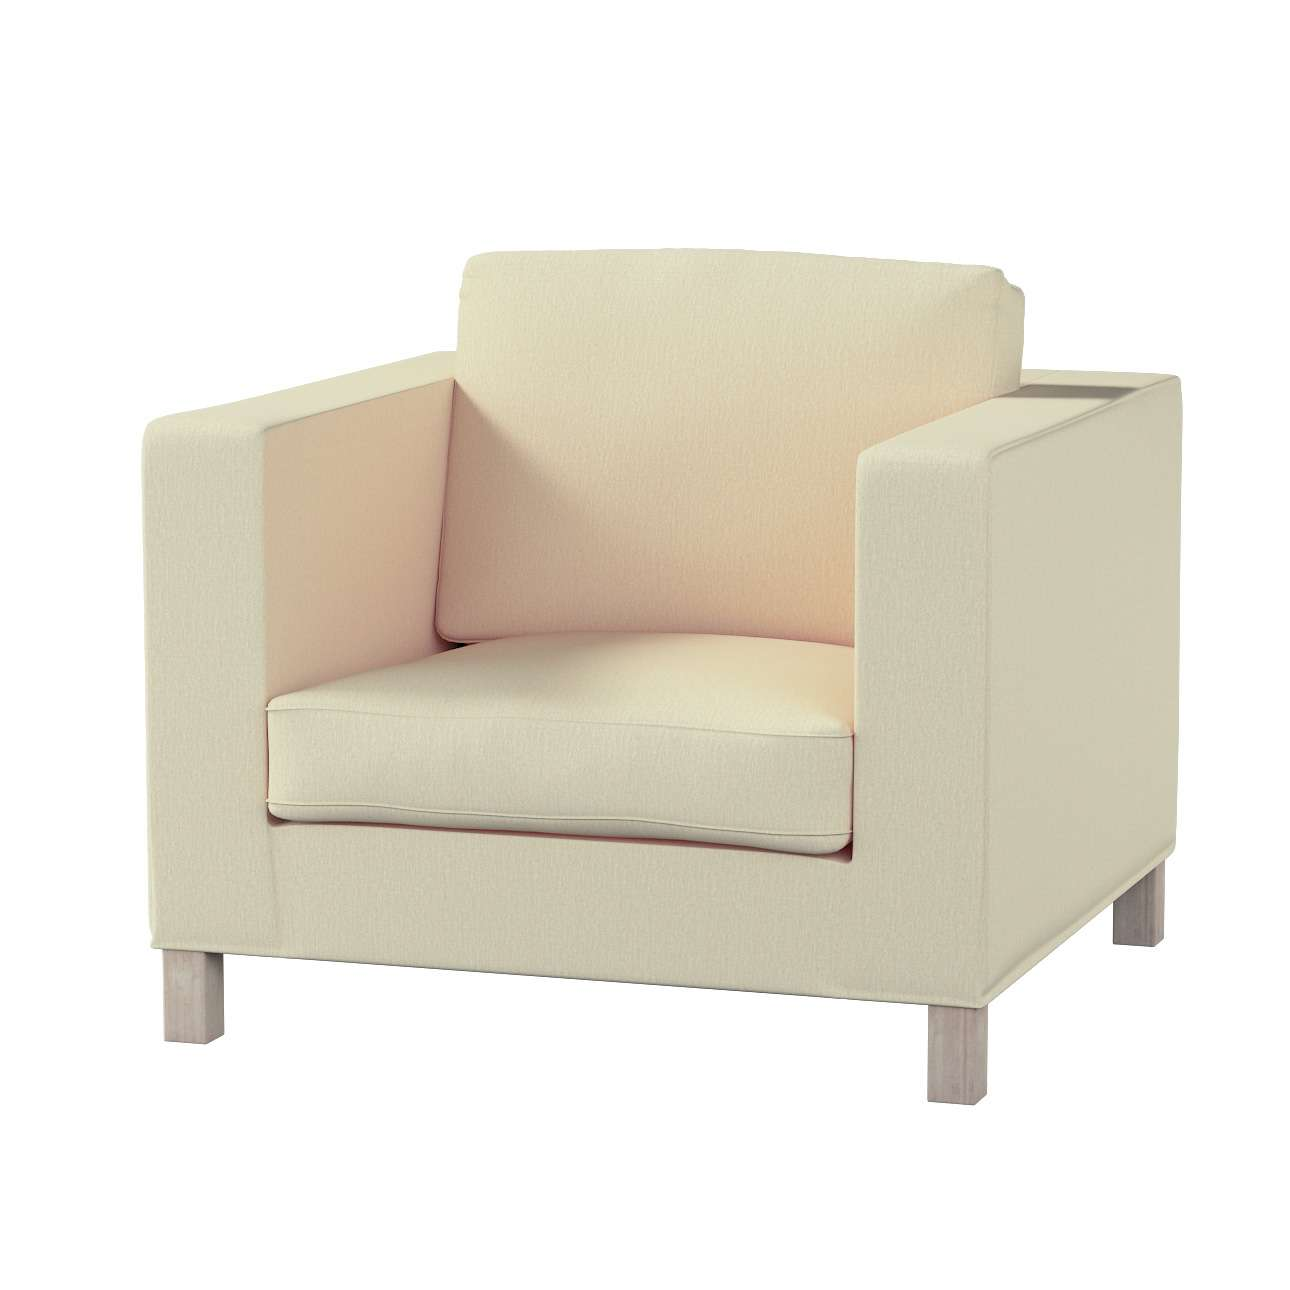 Pokrowiec na fotel Karlanda, krótki fotel Karlanda w kolekcji Chenille, tkanina: 702-22